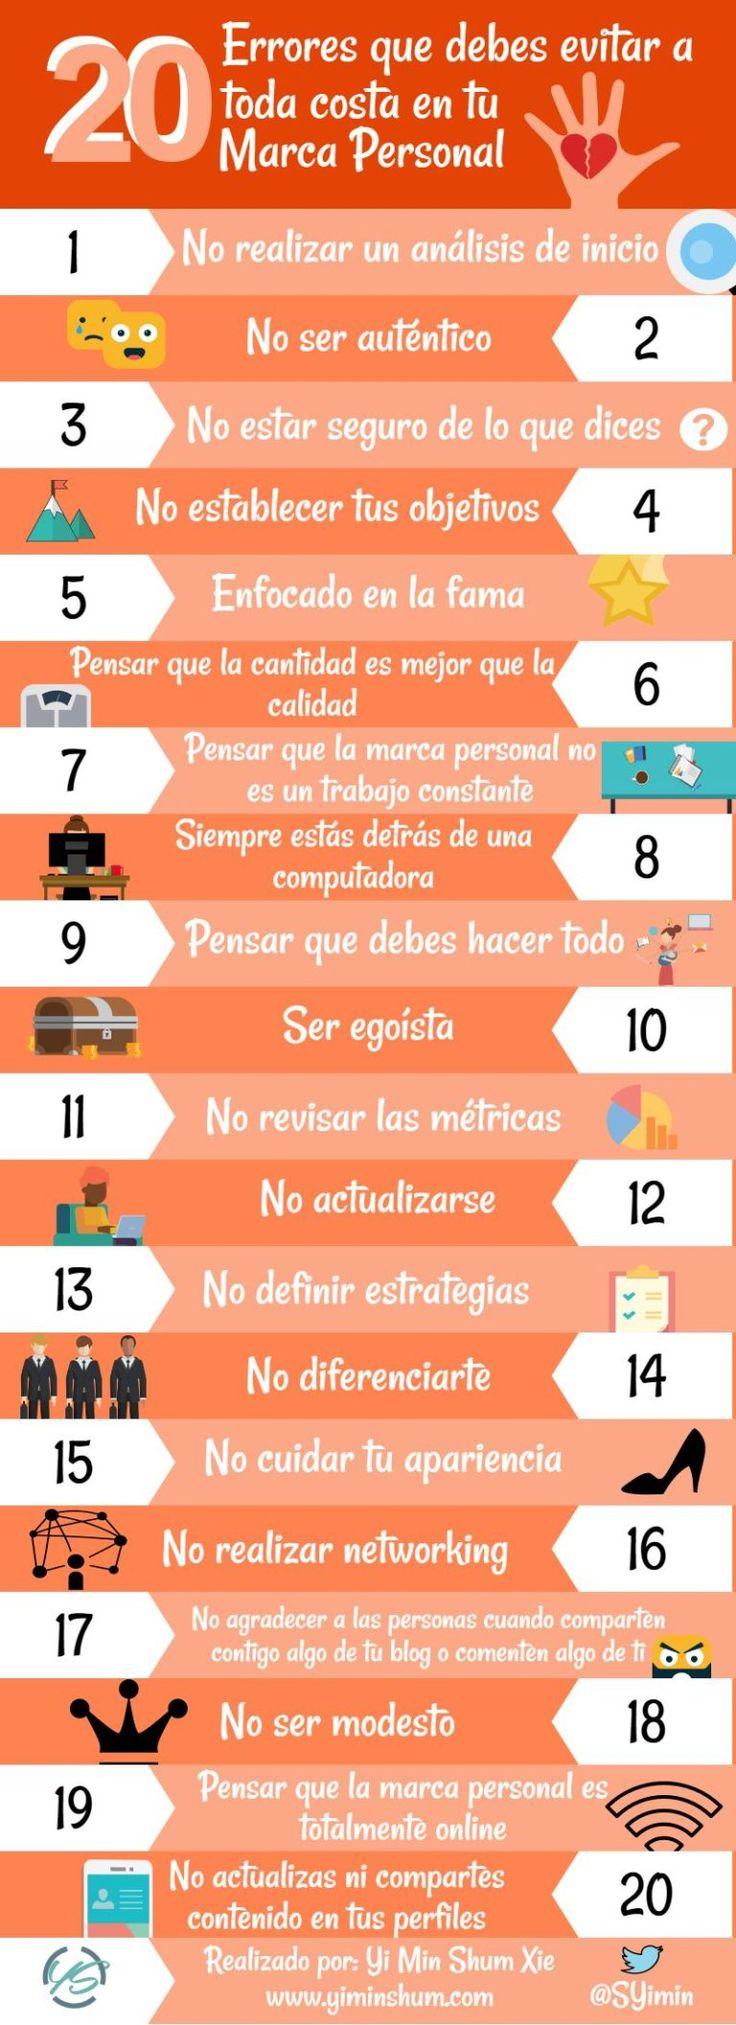 20 errores que debes evitar a toda costa en tu marca personal. Infografía en español. #CommunityManager